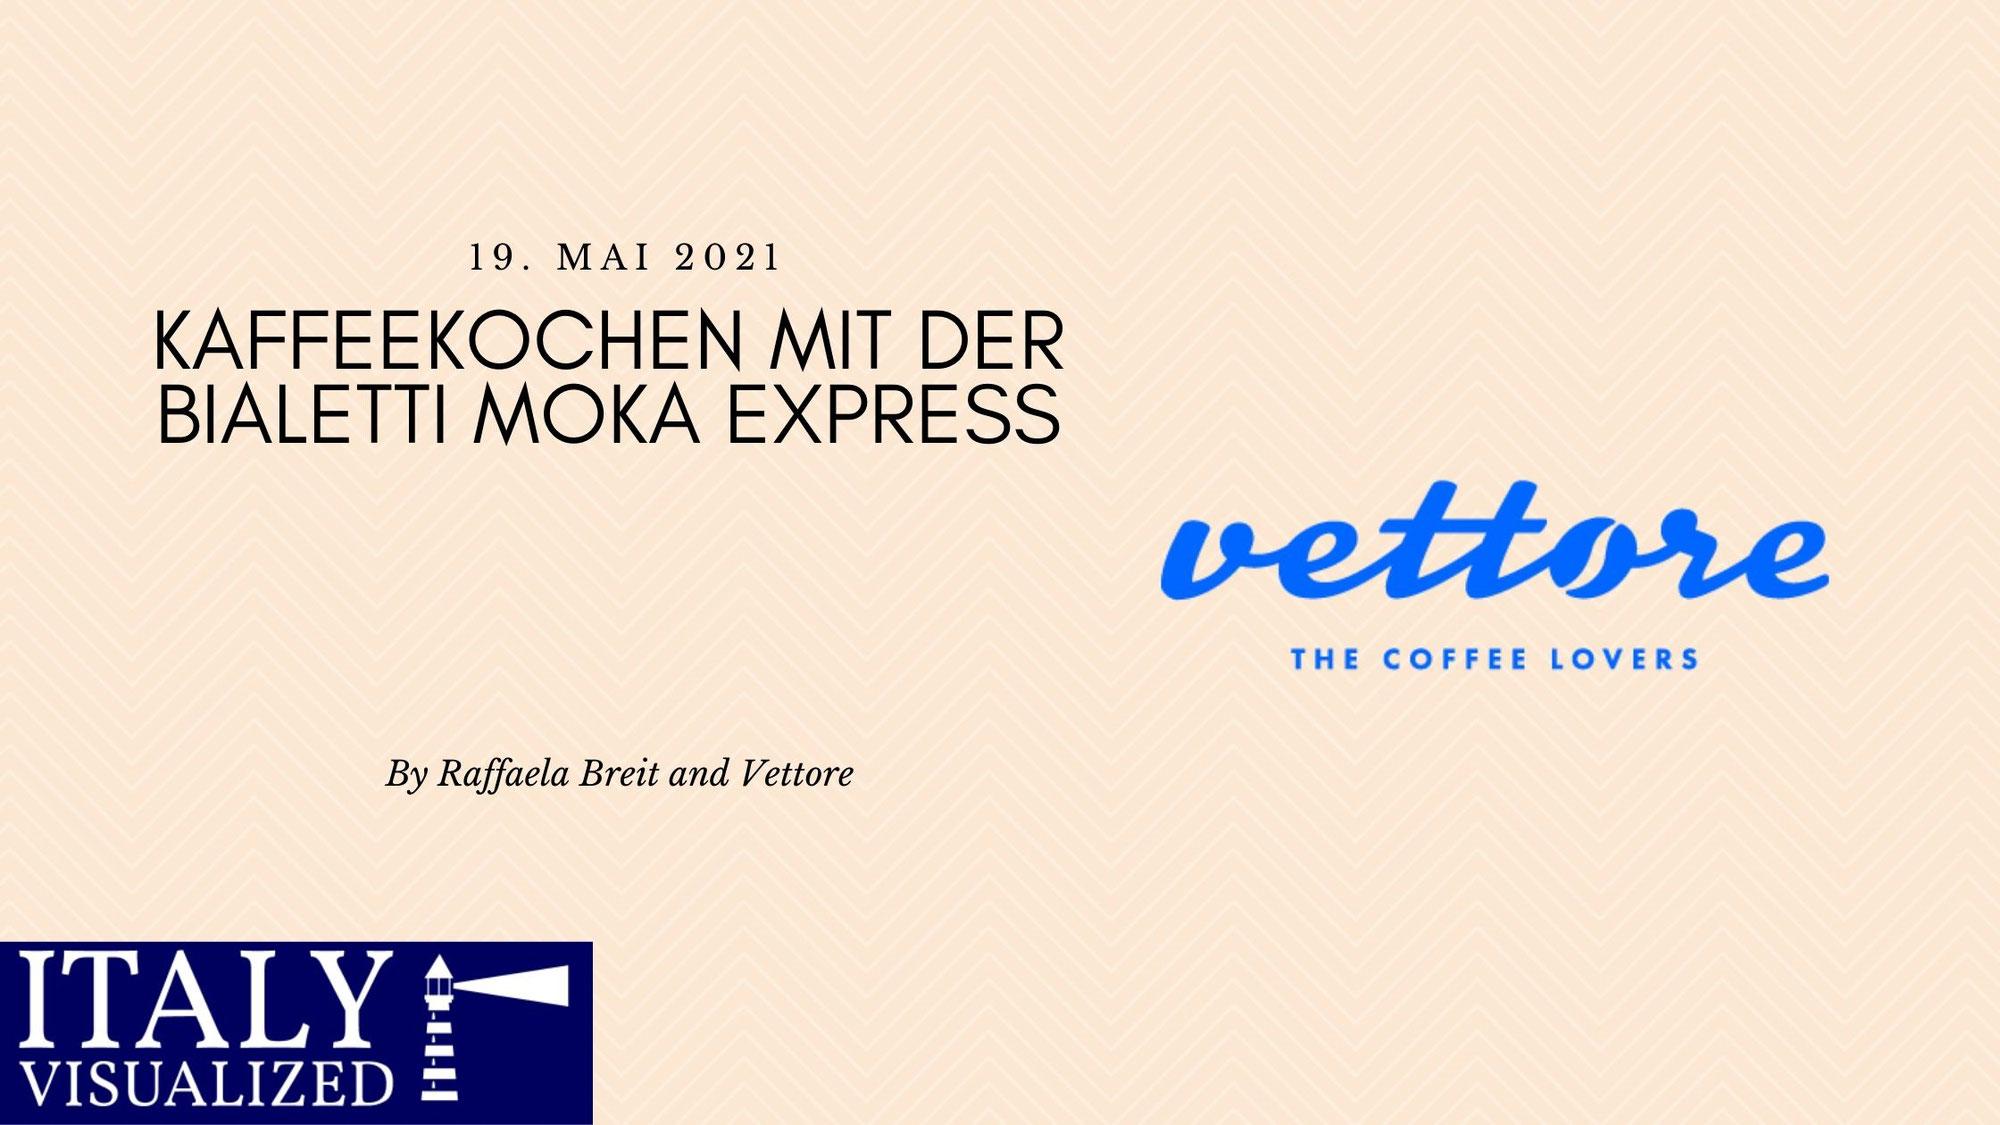 Kaffeekochen mit der Bialetti Moka Express